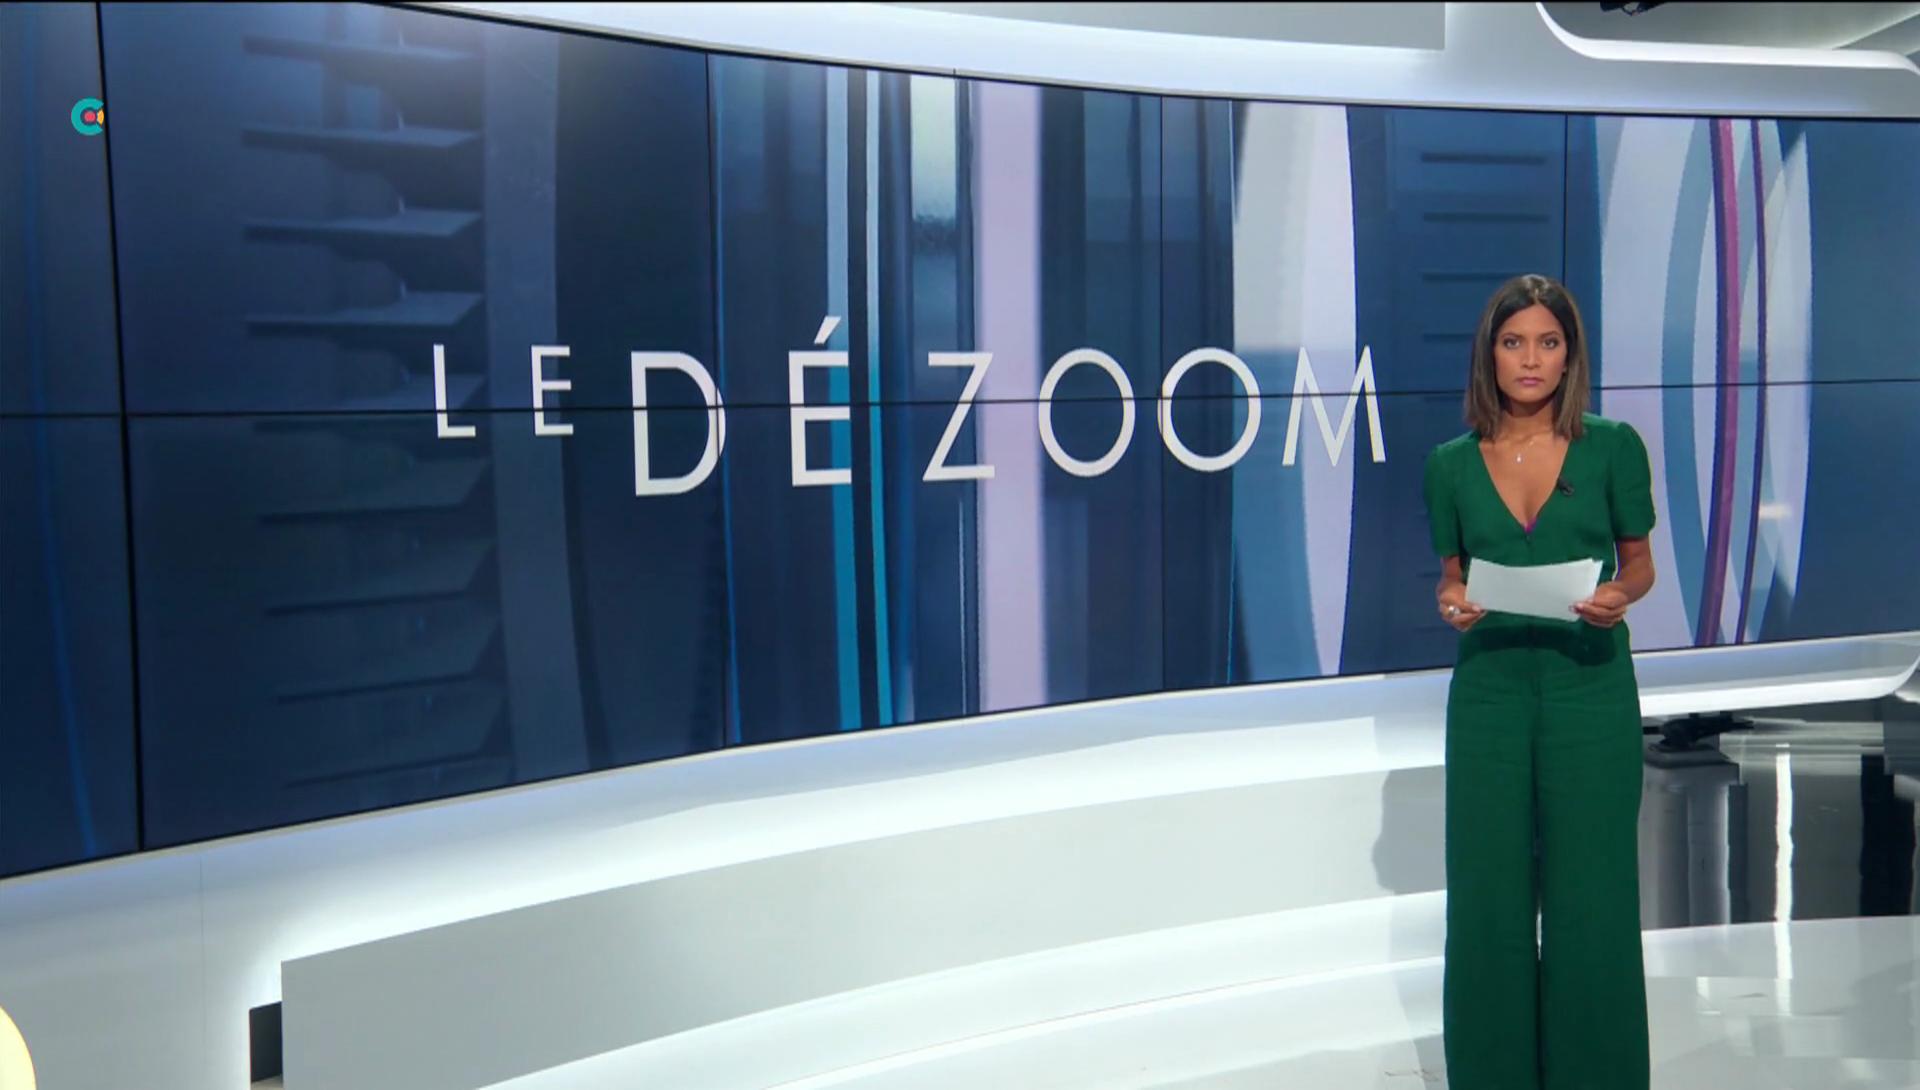 aureliecasse01.2019_09_04_journalledezoomBFMTV